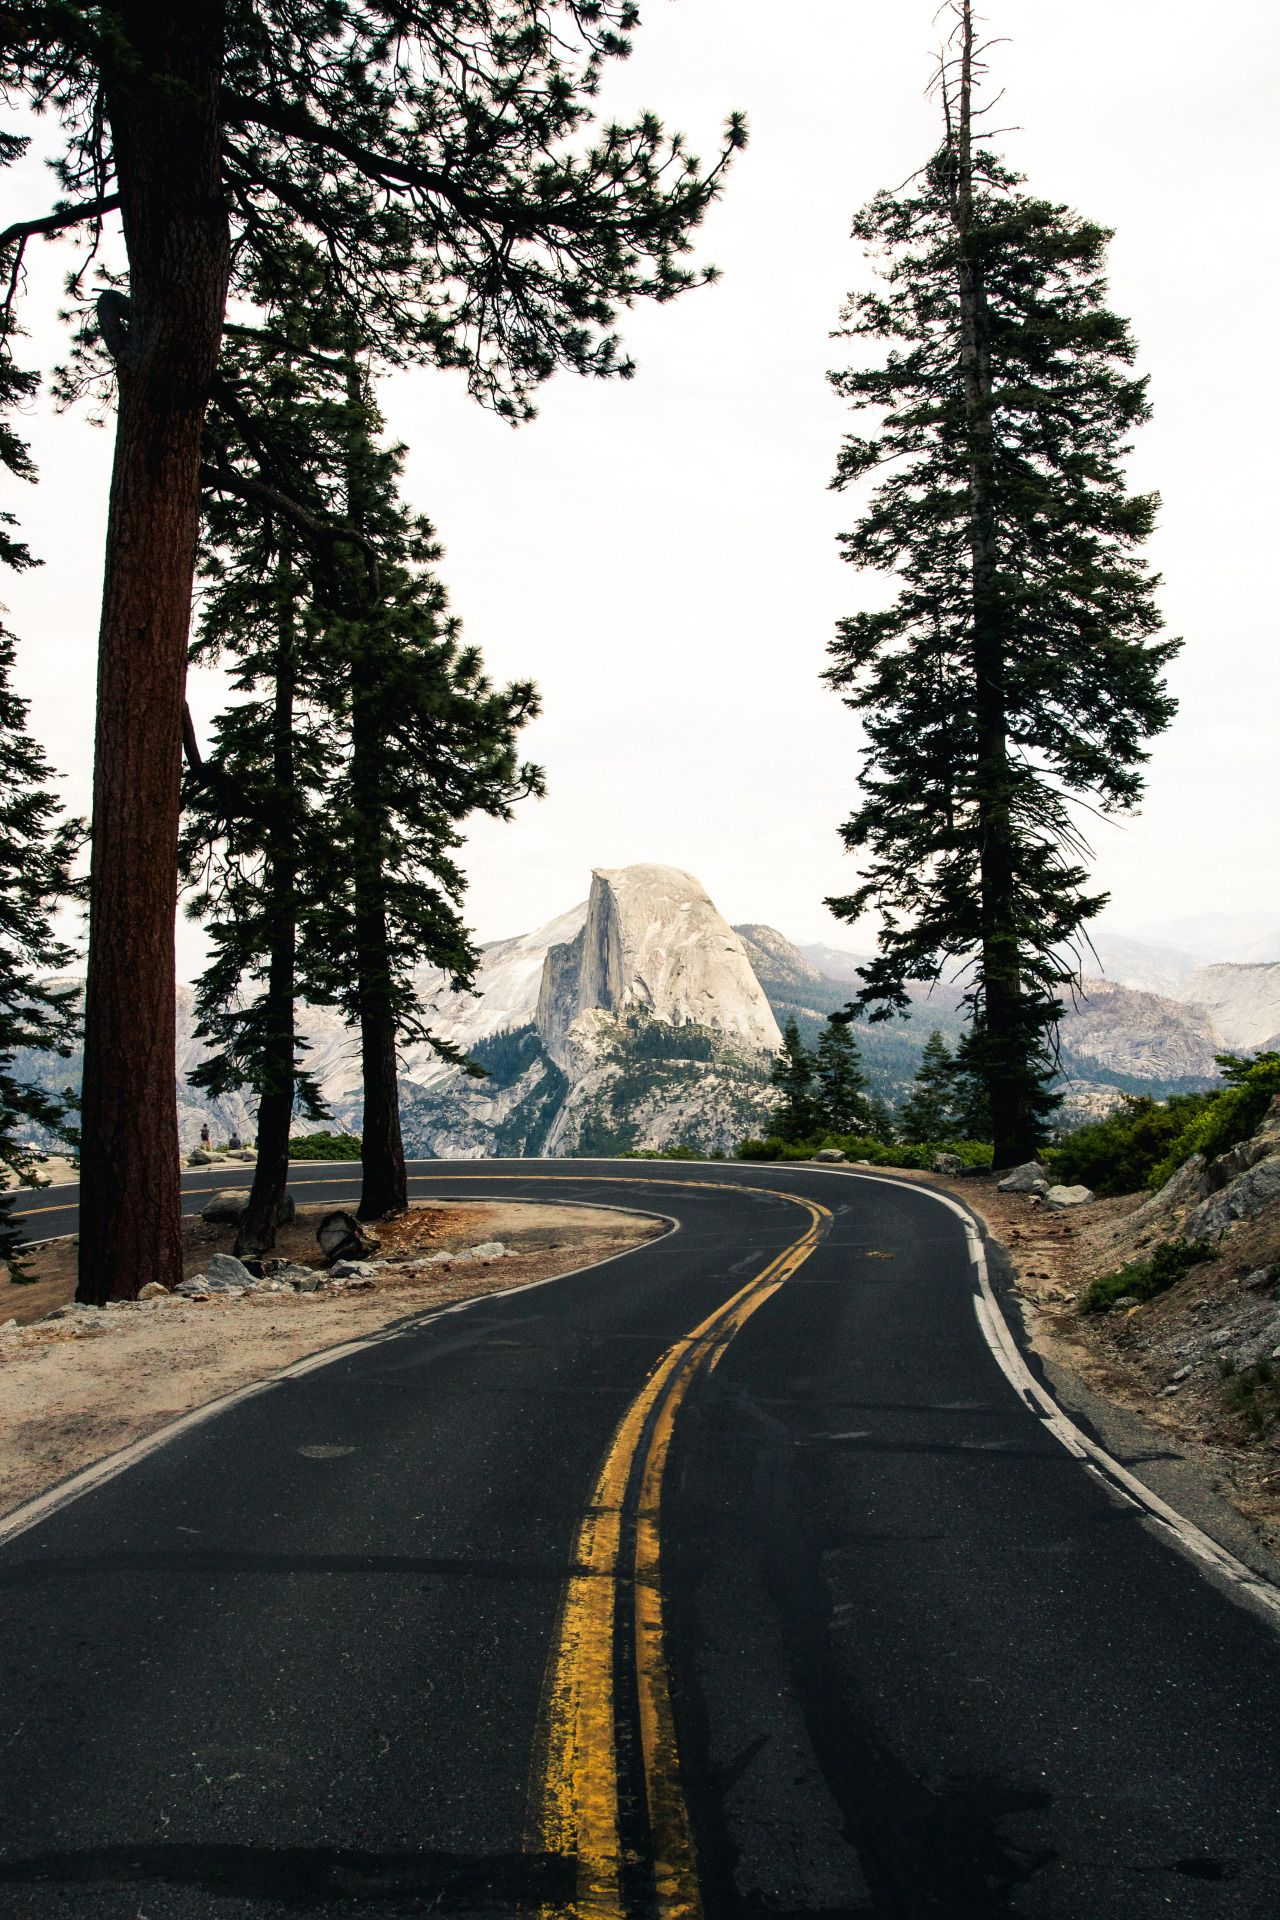 Glacier Point Road, Yosemite Fantasy Road Trip Road Trip Road Road photo on the road drive travel wanderlust bucket list landscape photography photographer ...